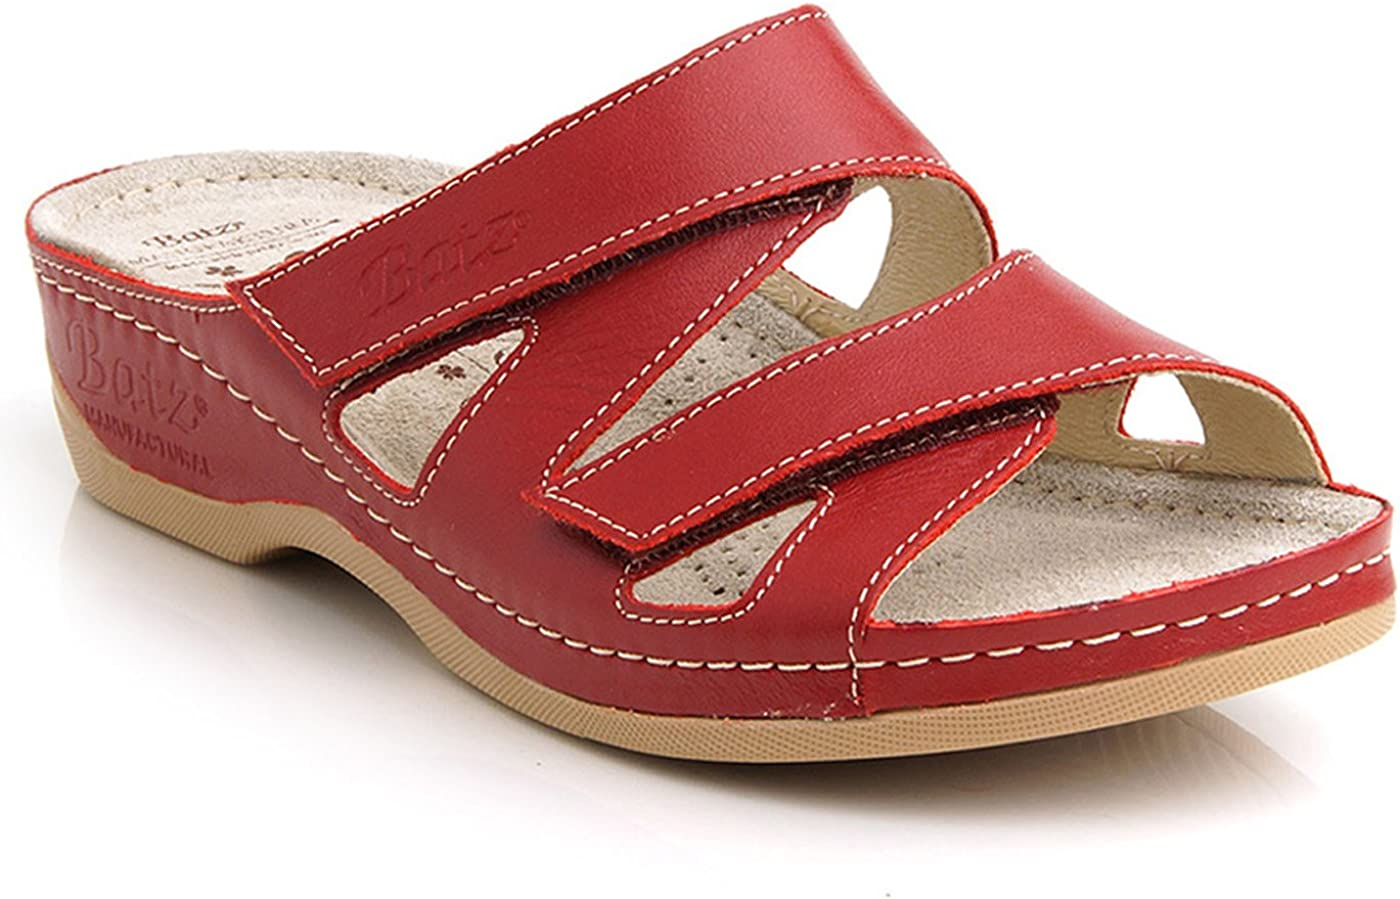 BATZ ENI Handmade Leather Womens Ladies Slip-on Sandals Clogs Mules